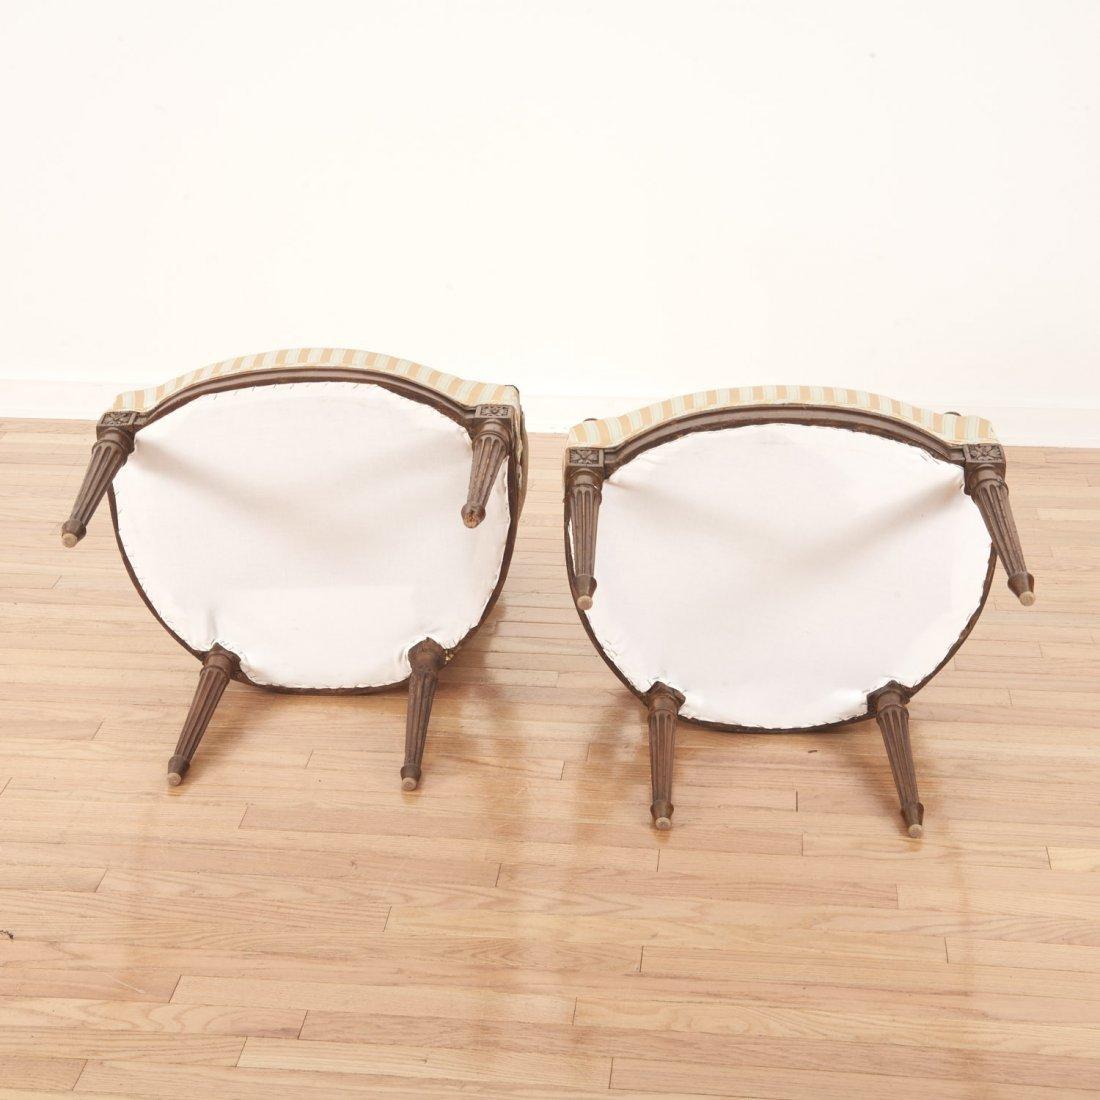 Pr Directoire silk upholstered mahogany fauteuils - 9